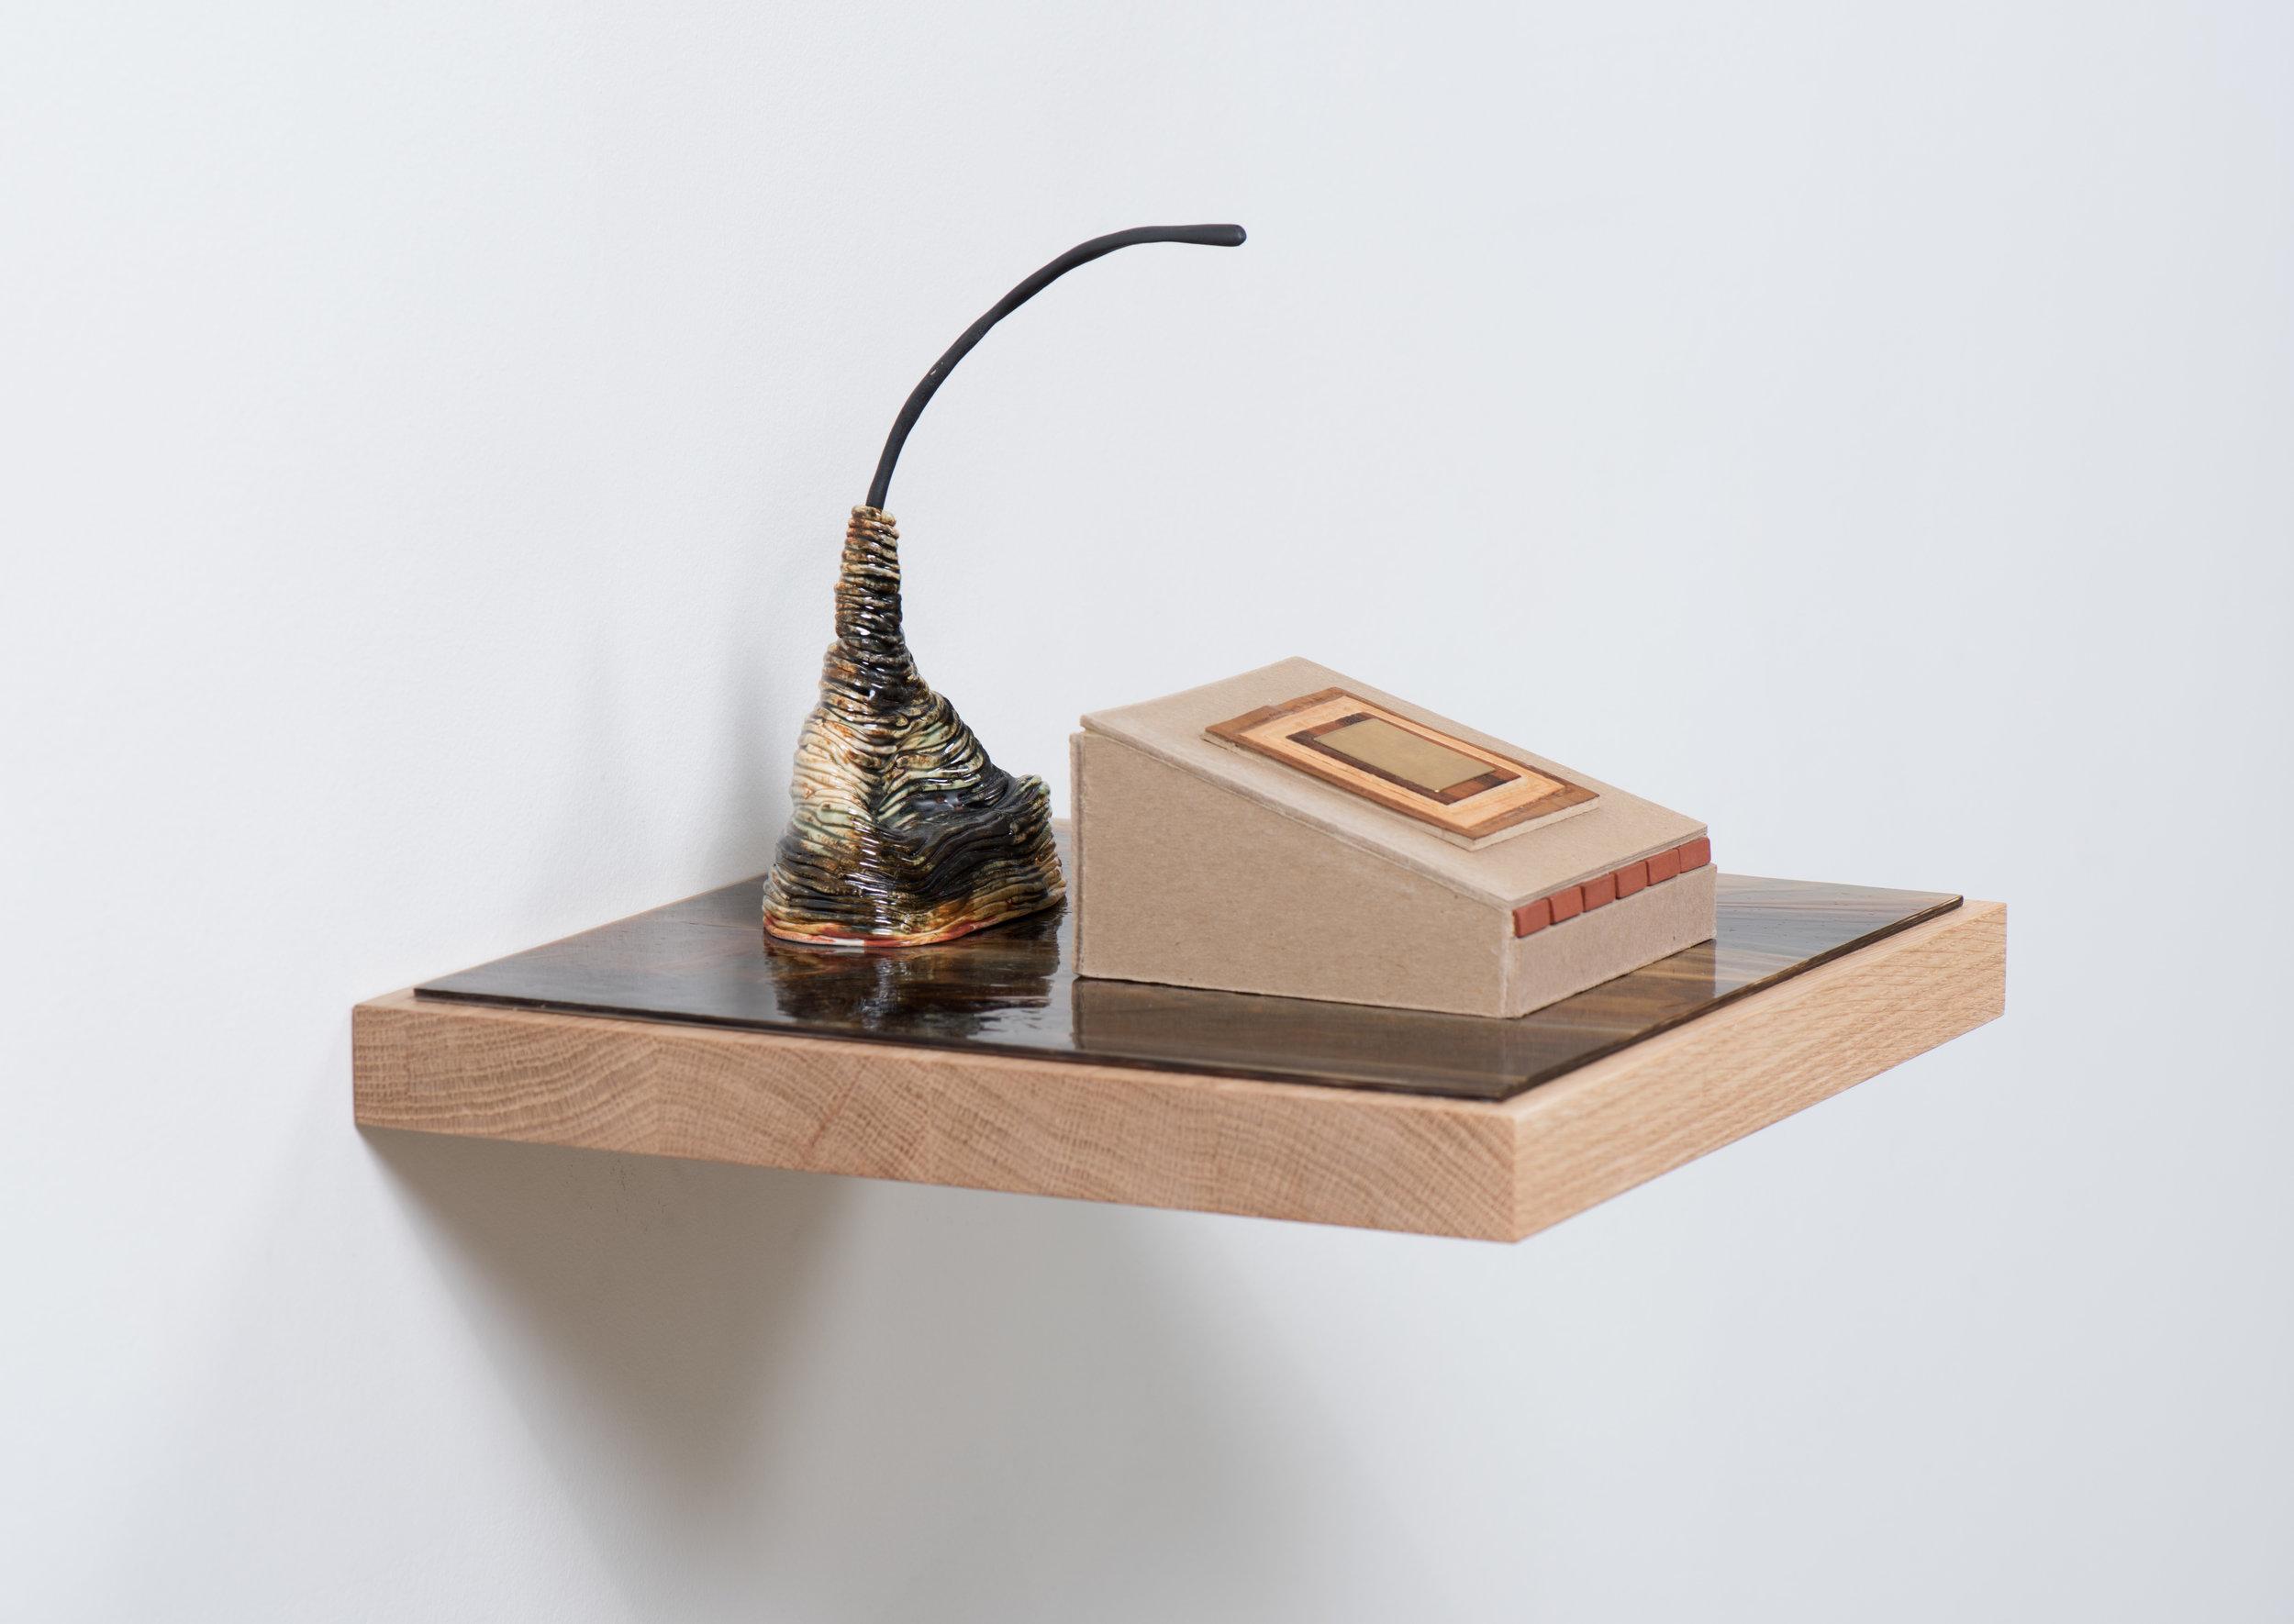 Gabrielle Ferrer  Marker , 2019 Glass, ceramic, chipboard, veneer, brass, and clay bricks 8 1/2 x 12 x 12 inches